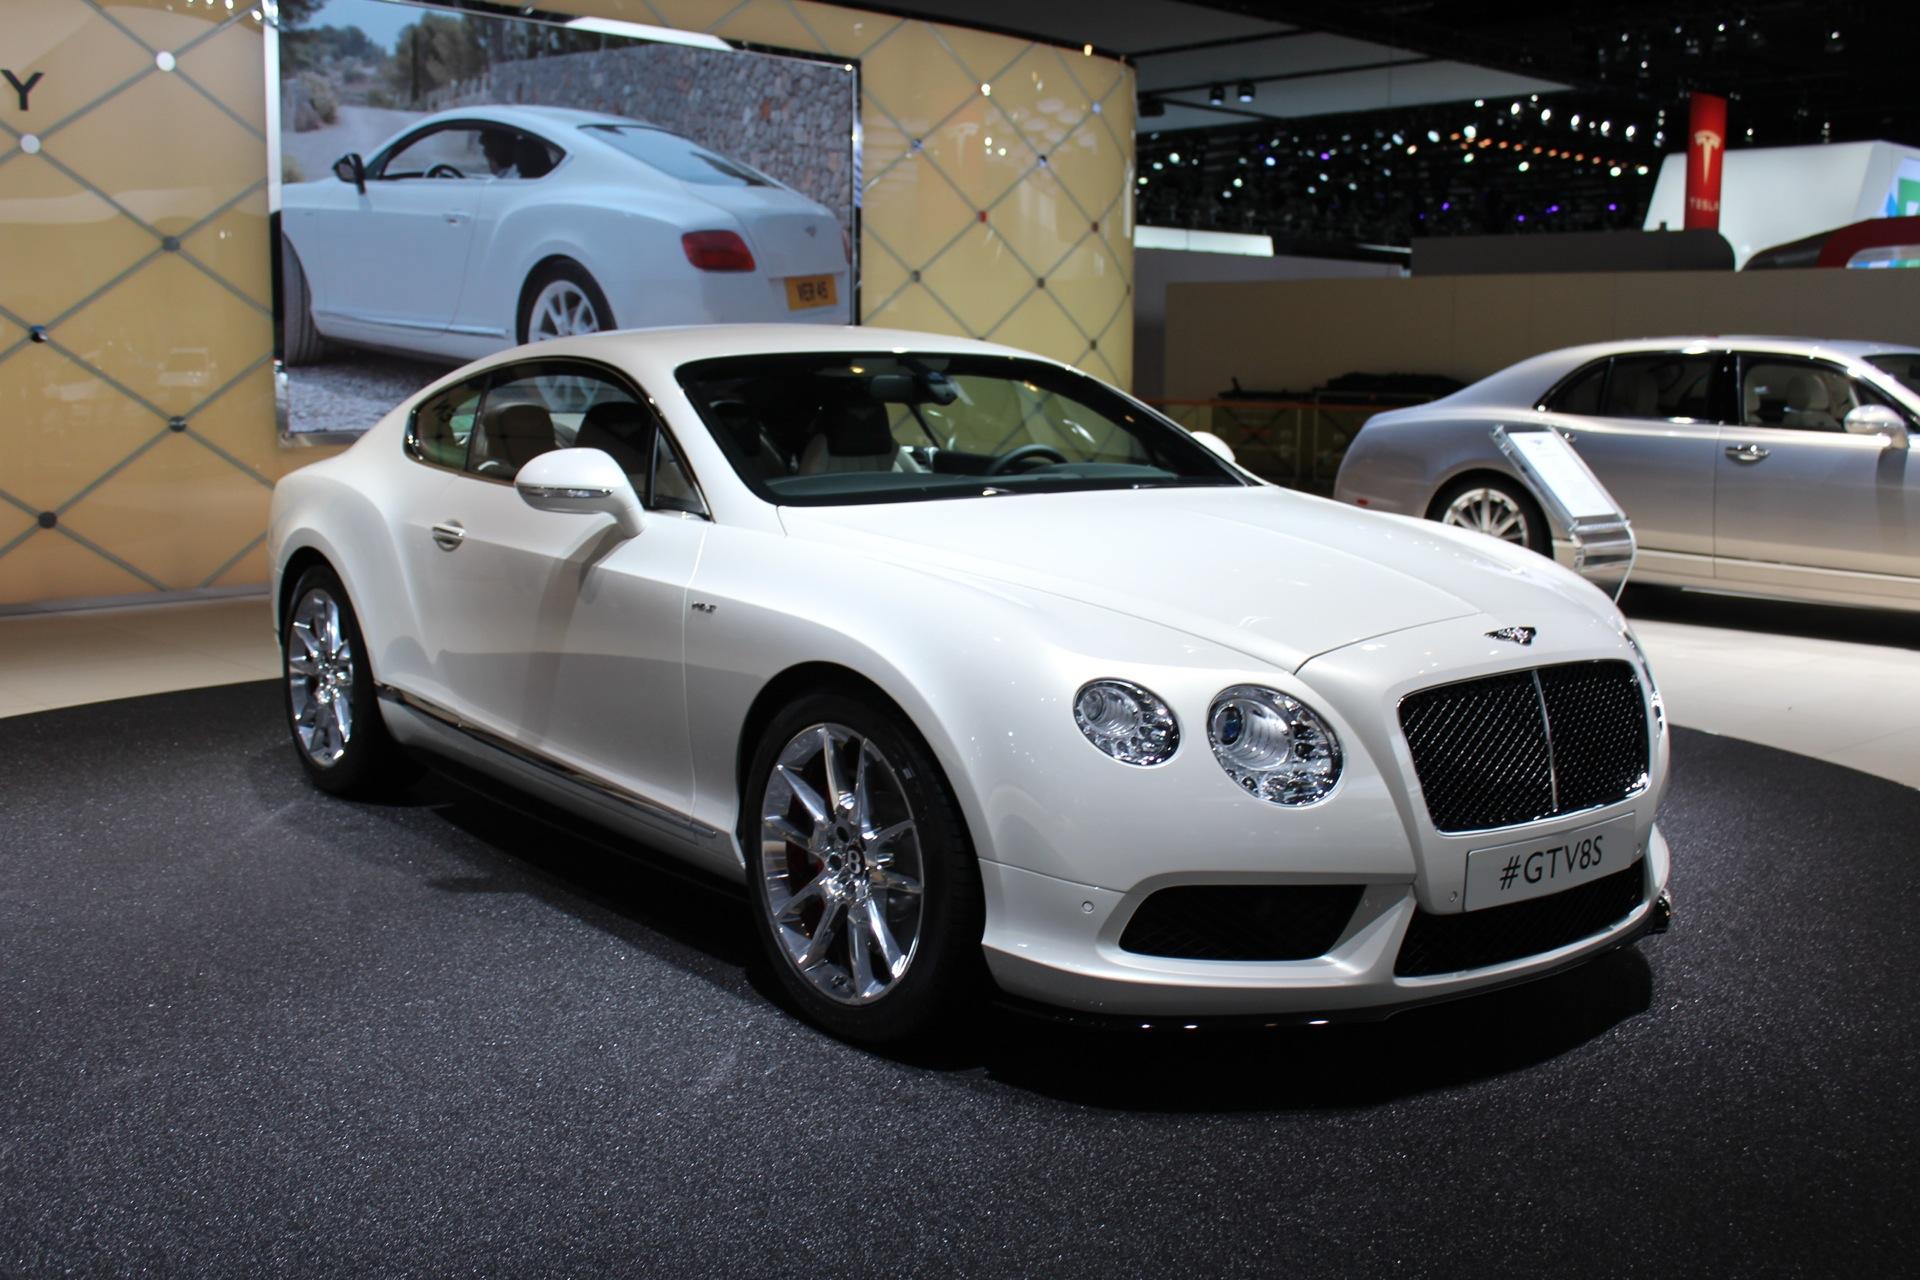 2014 Bentley GT V8 S Preview Live Photos 2014 Detroit